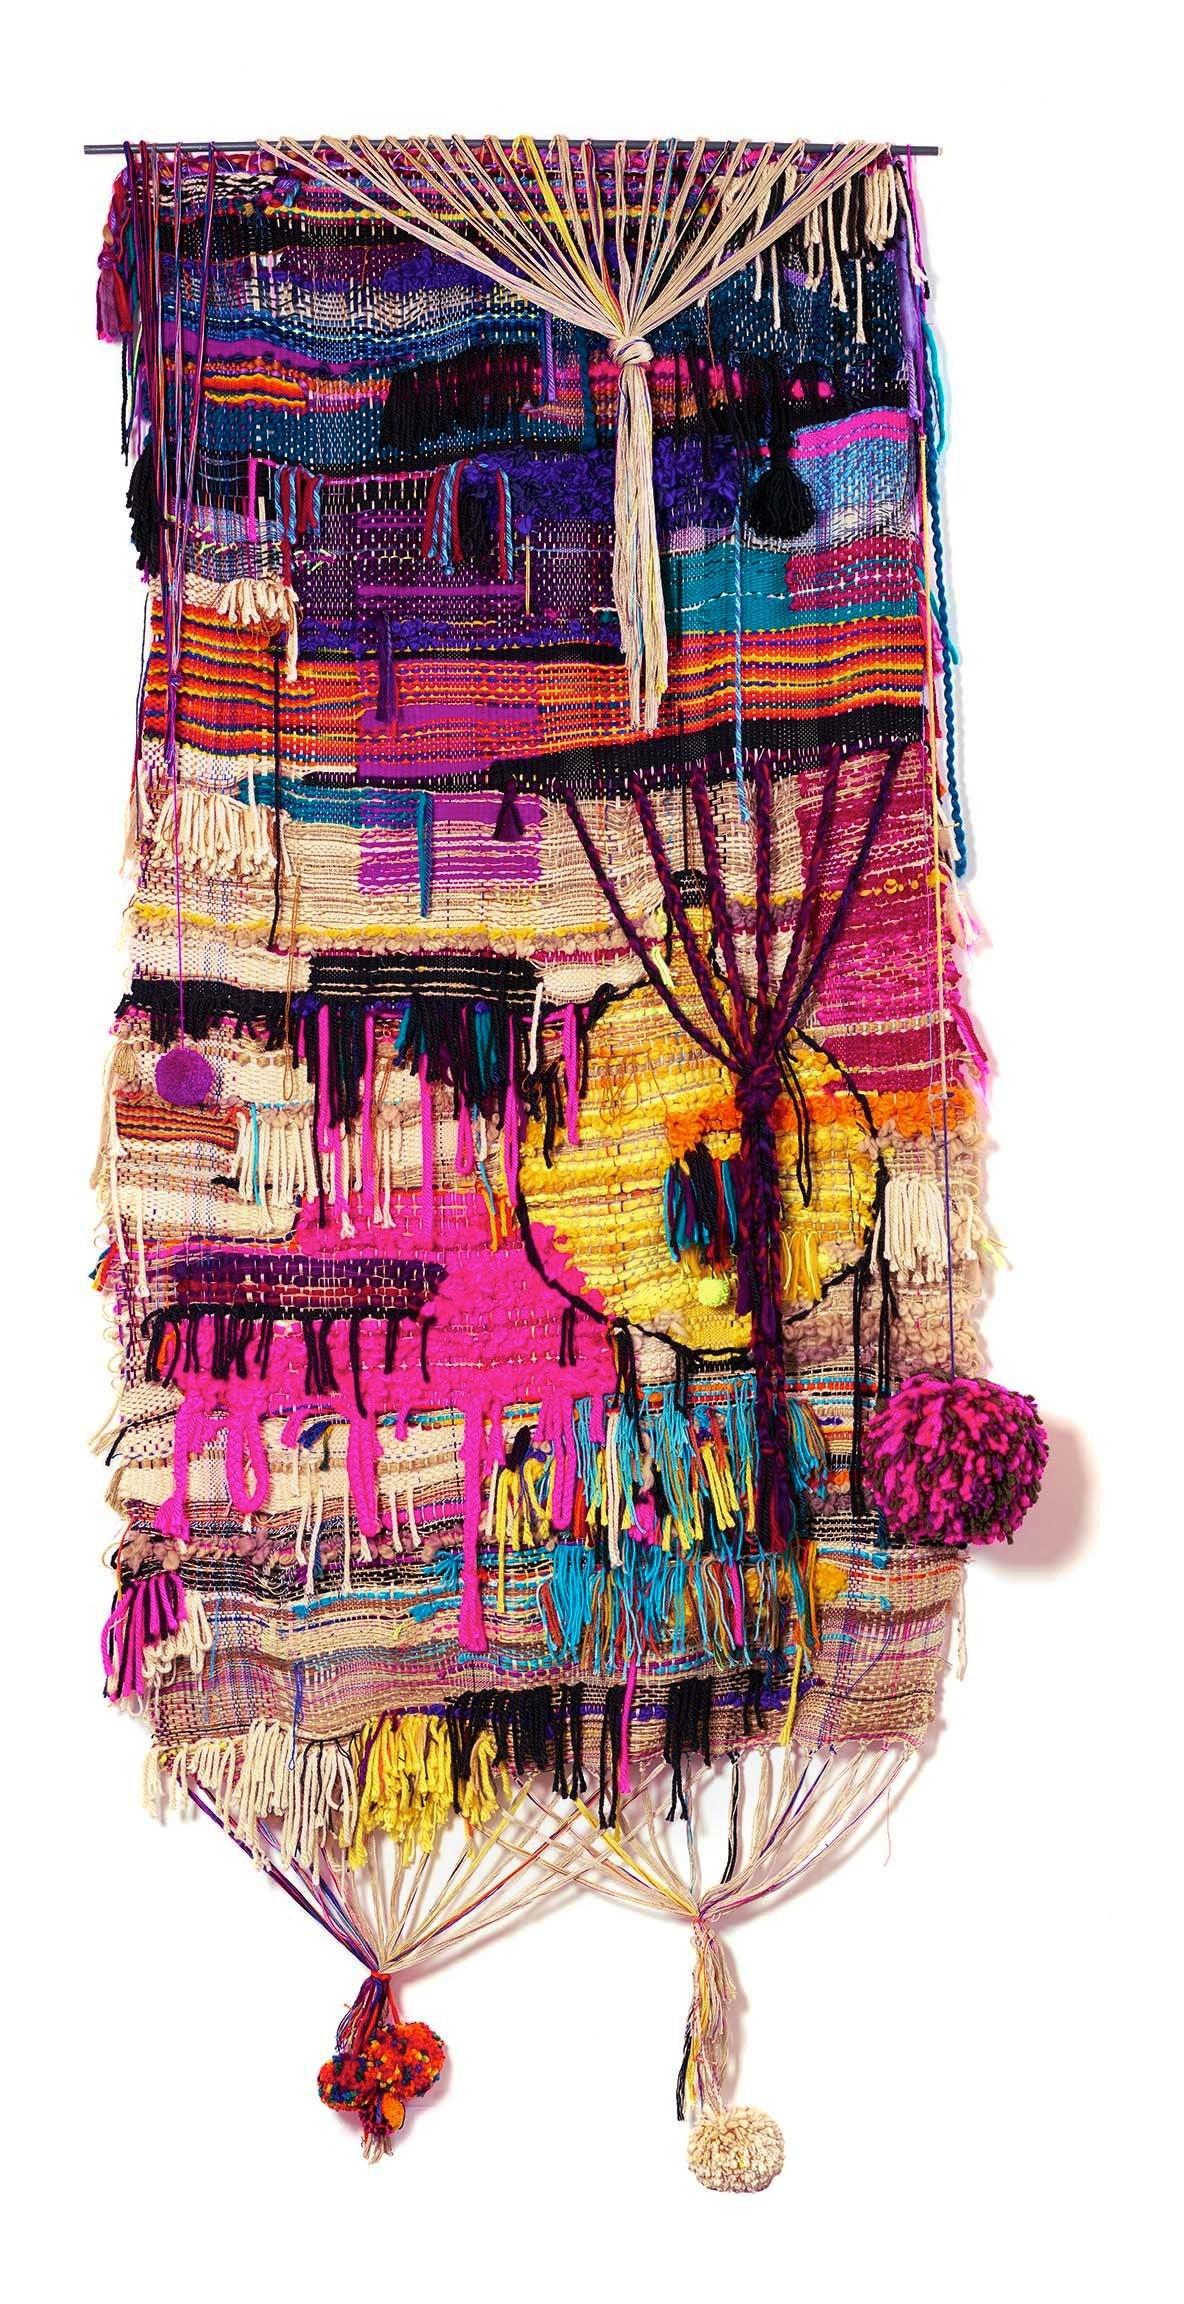 "2014, 98"" x 43"", acrylic, wool, hemp, jute, cotton"